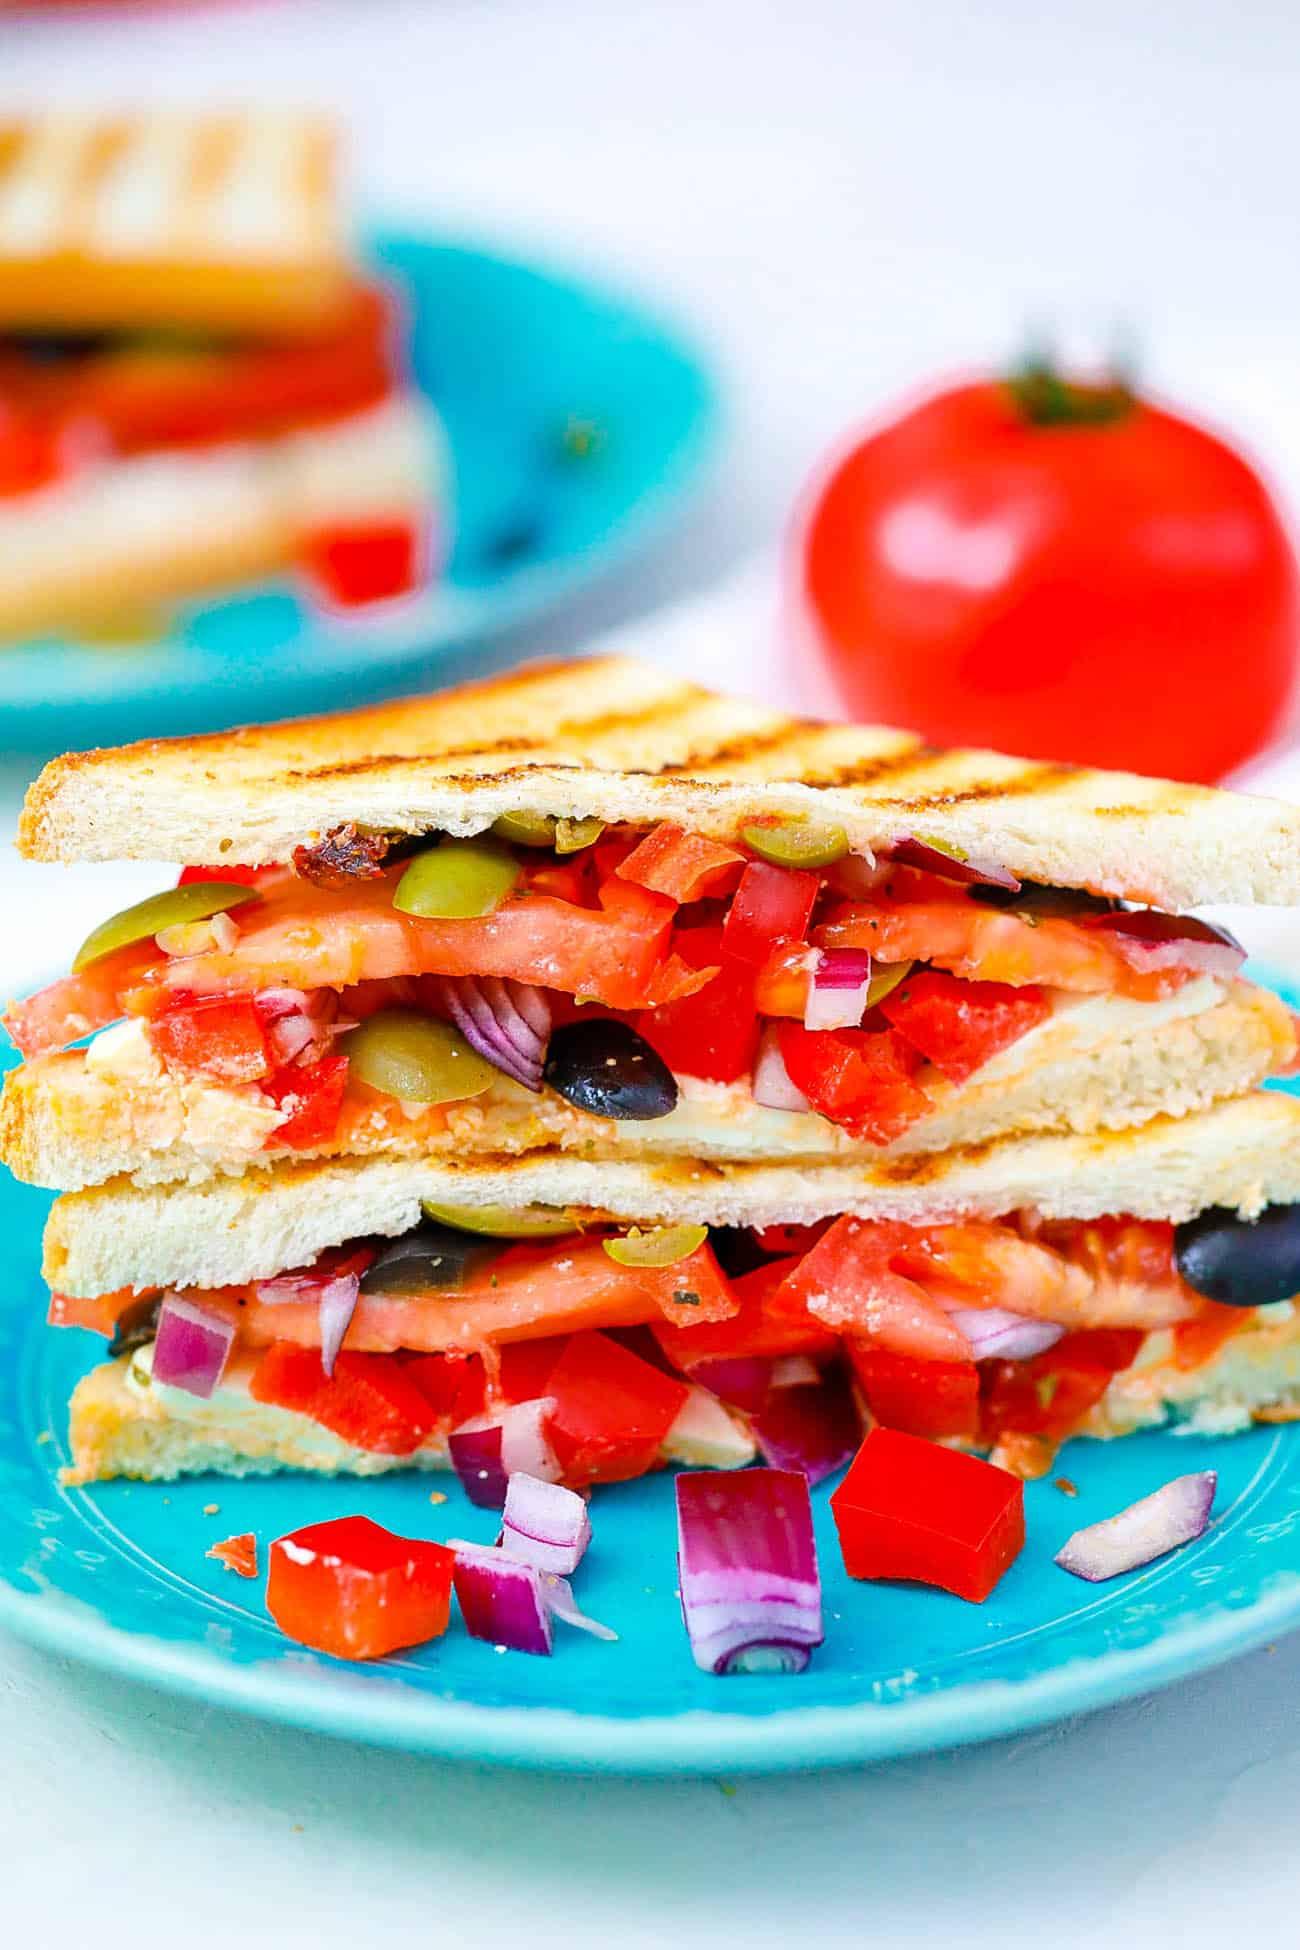 mediterranean sandwich cut in half on a blue plate